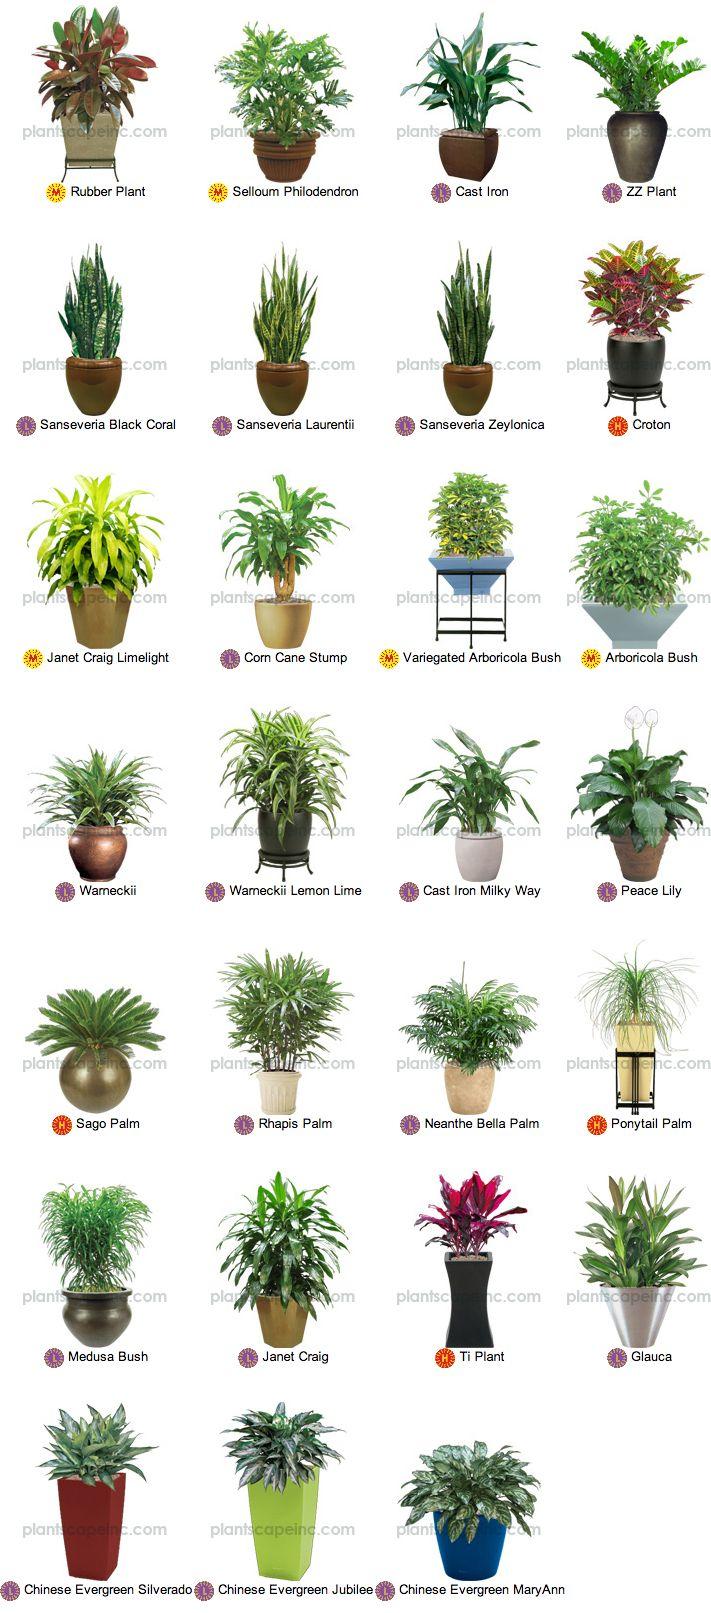 Best Kitchen Gallery: Home Plants Types Home Furniture Design Kitchenagenda of Household Tropical Plants on rachelxblog.com